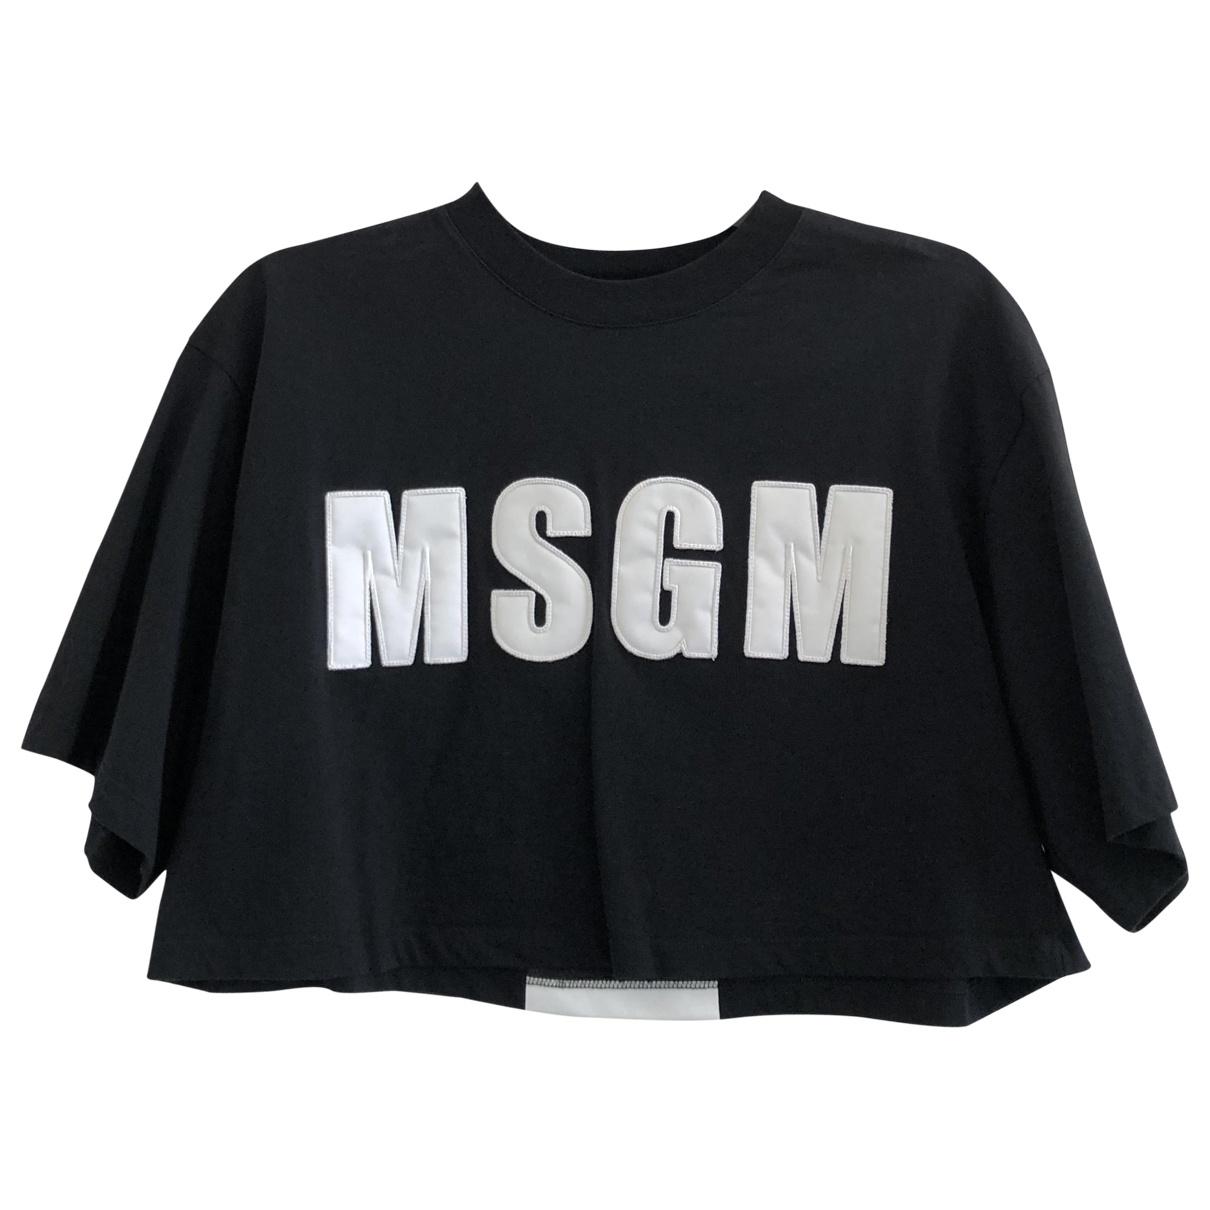 Msgm \N Top in  Schwarz Baumwolle